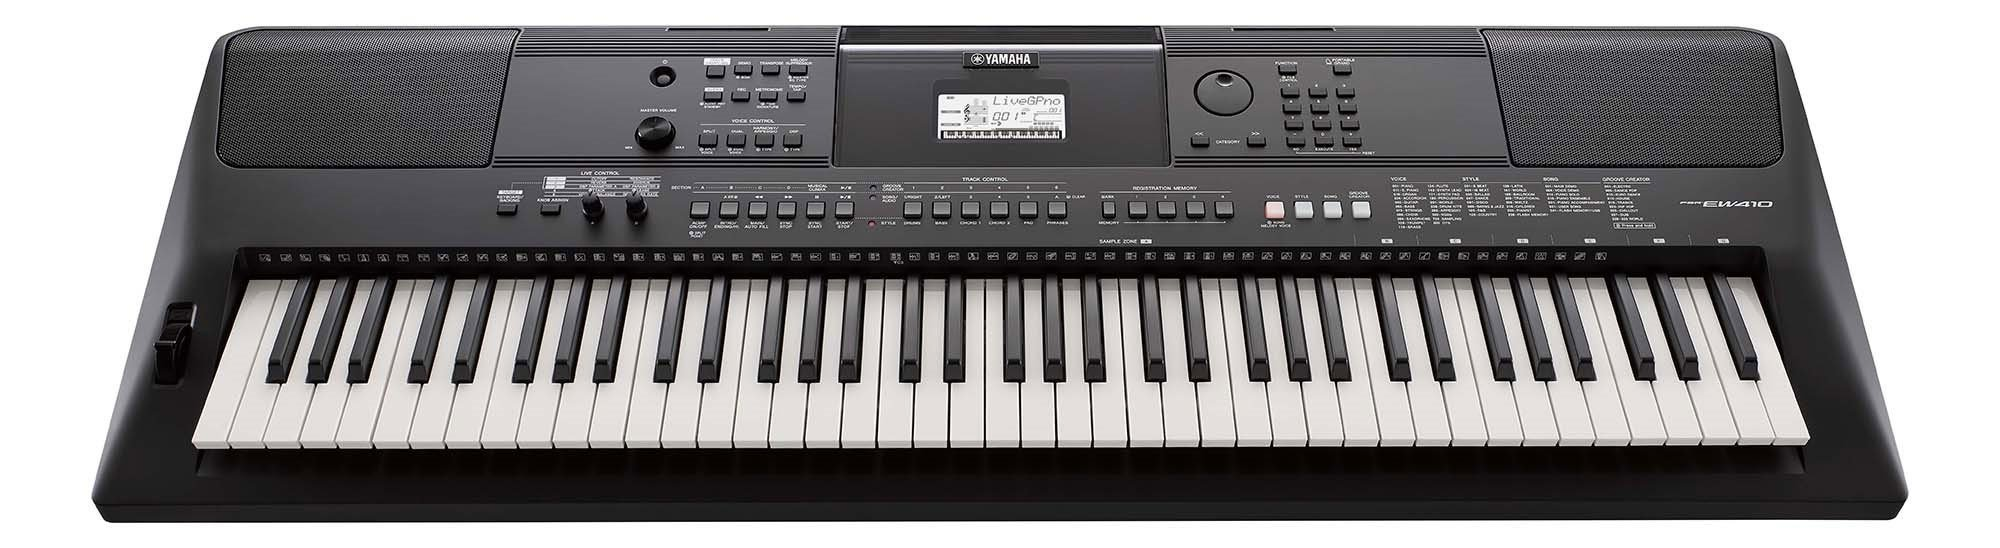 PSREW410 76 Key Portable Keyboard